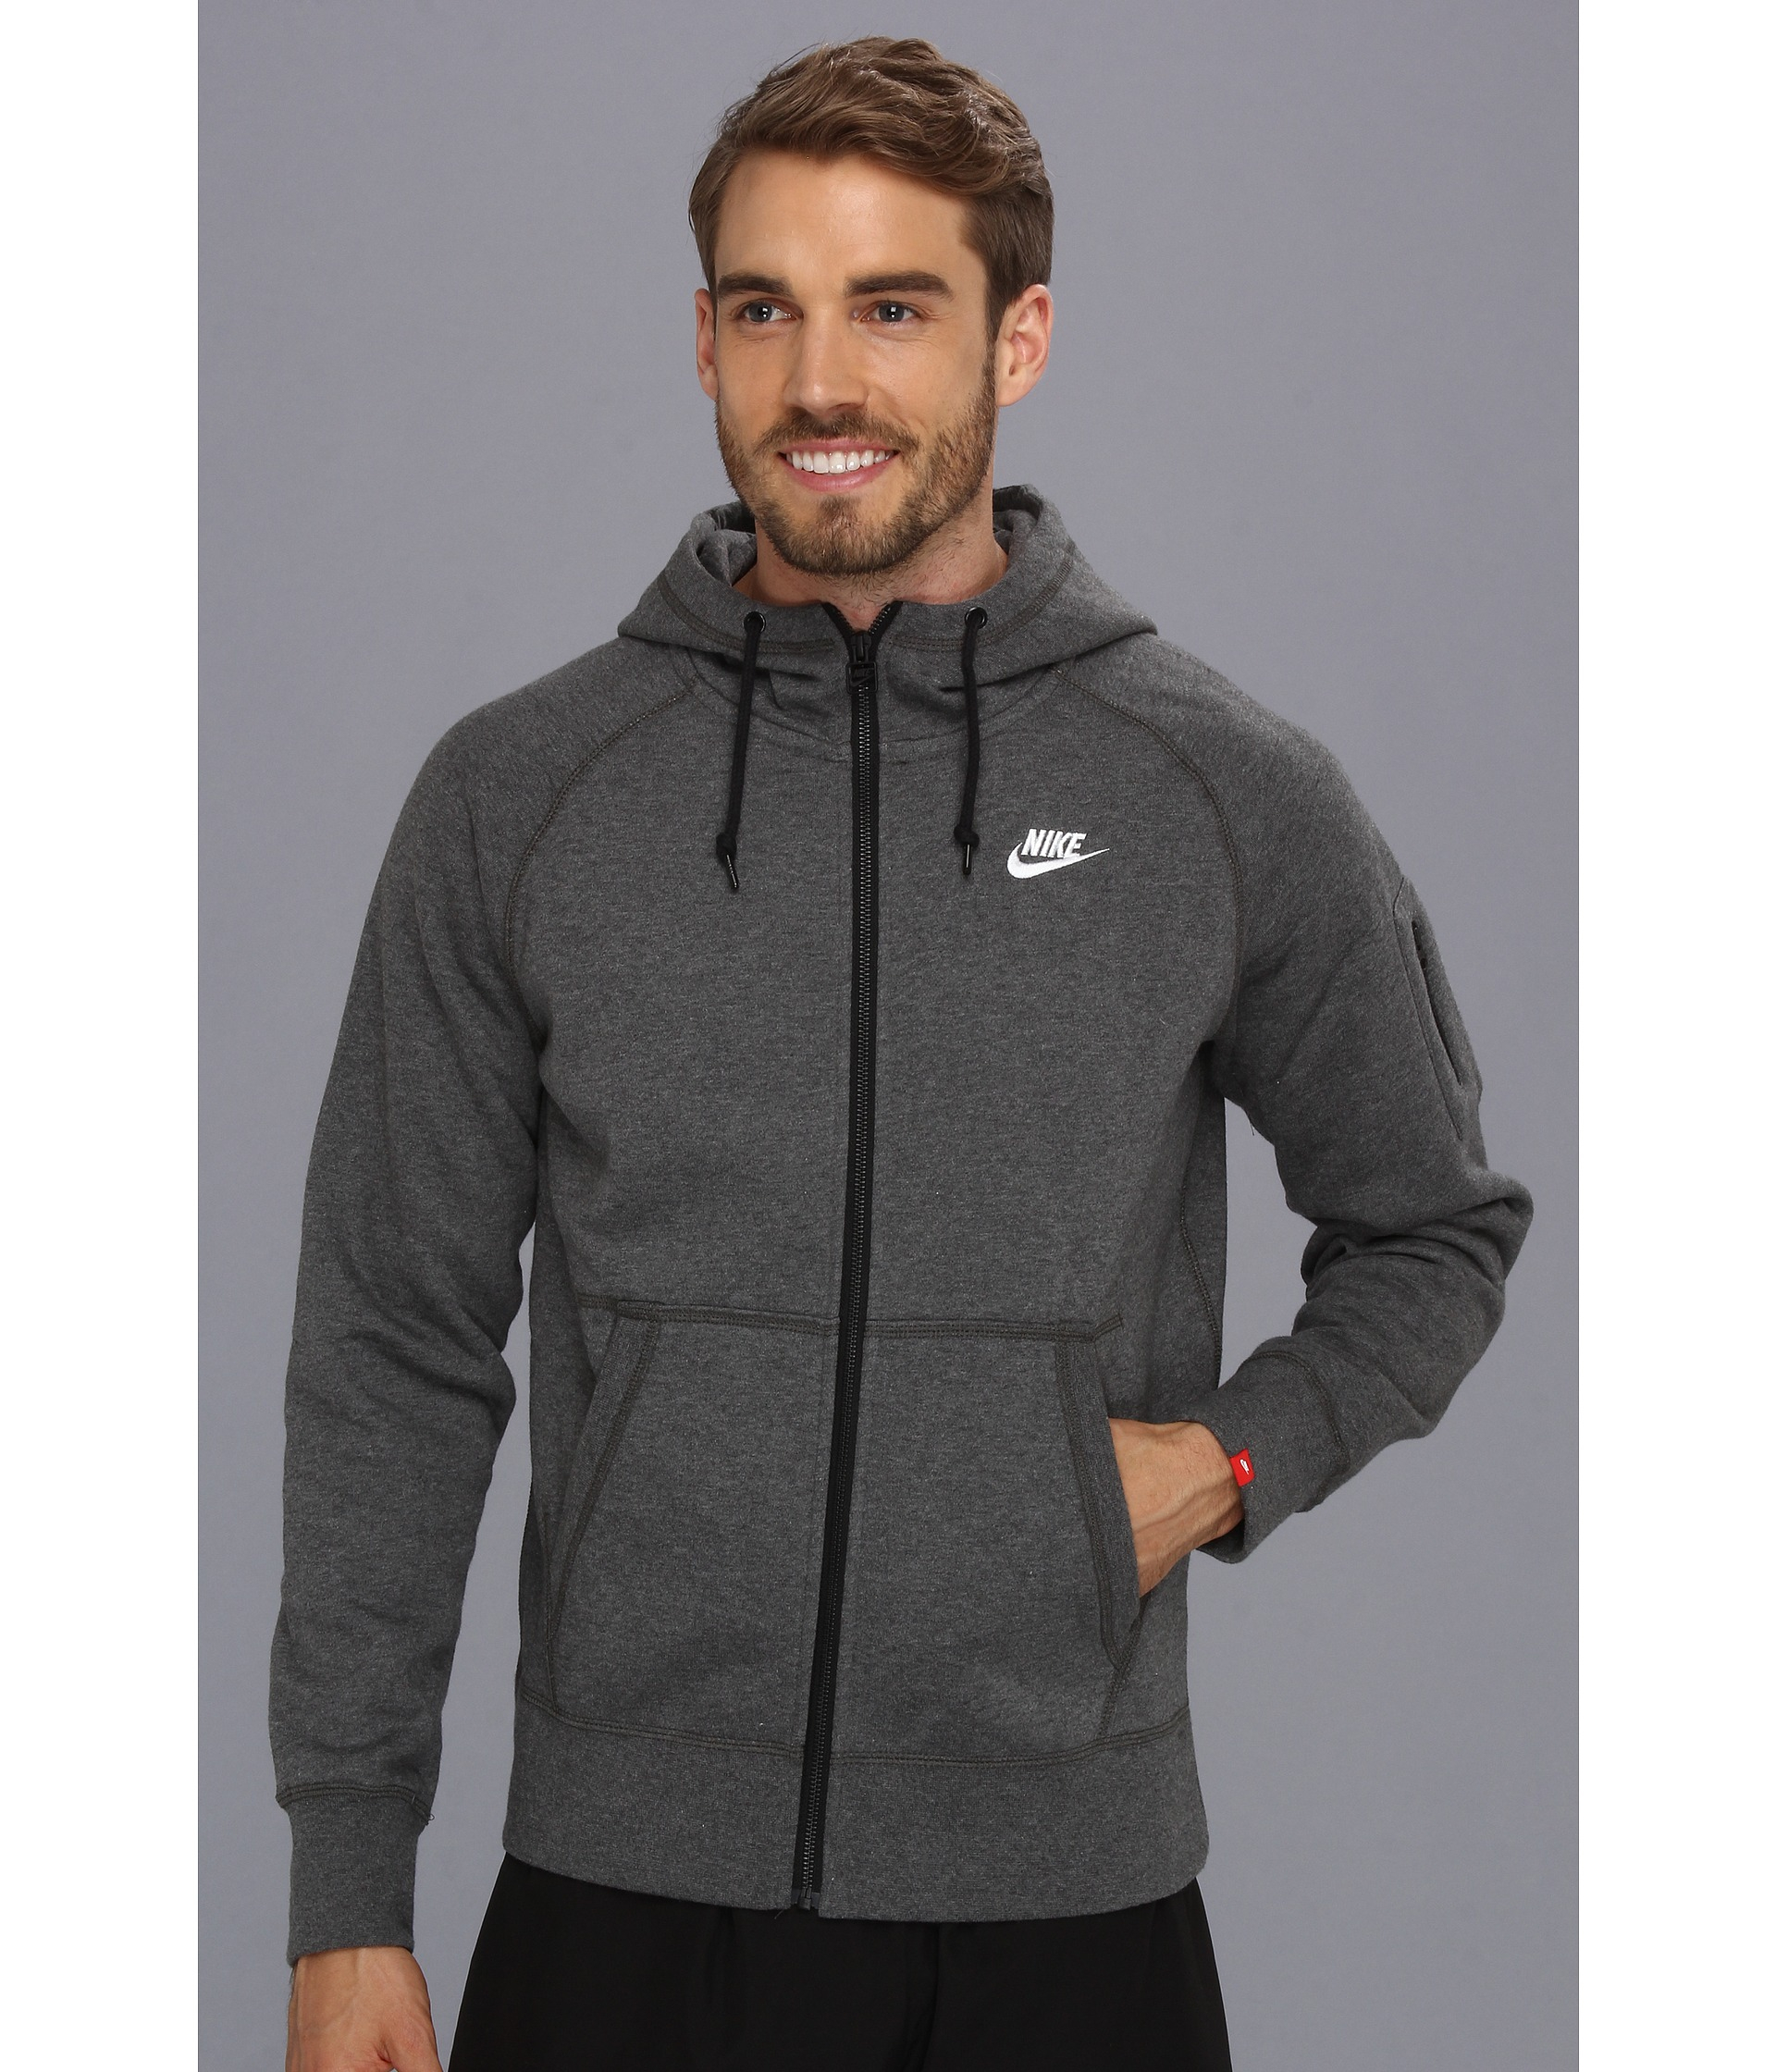 5d90b26a68 Lyst - Nike Aw77 Fleece Fz Hoodie in Gray for Men